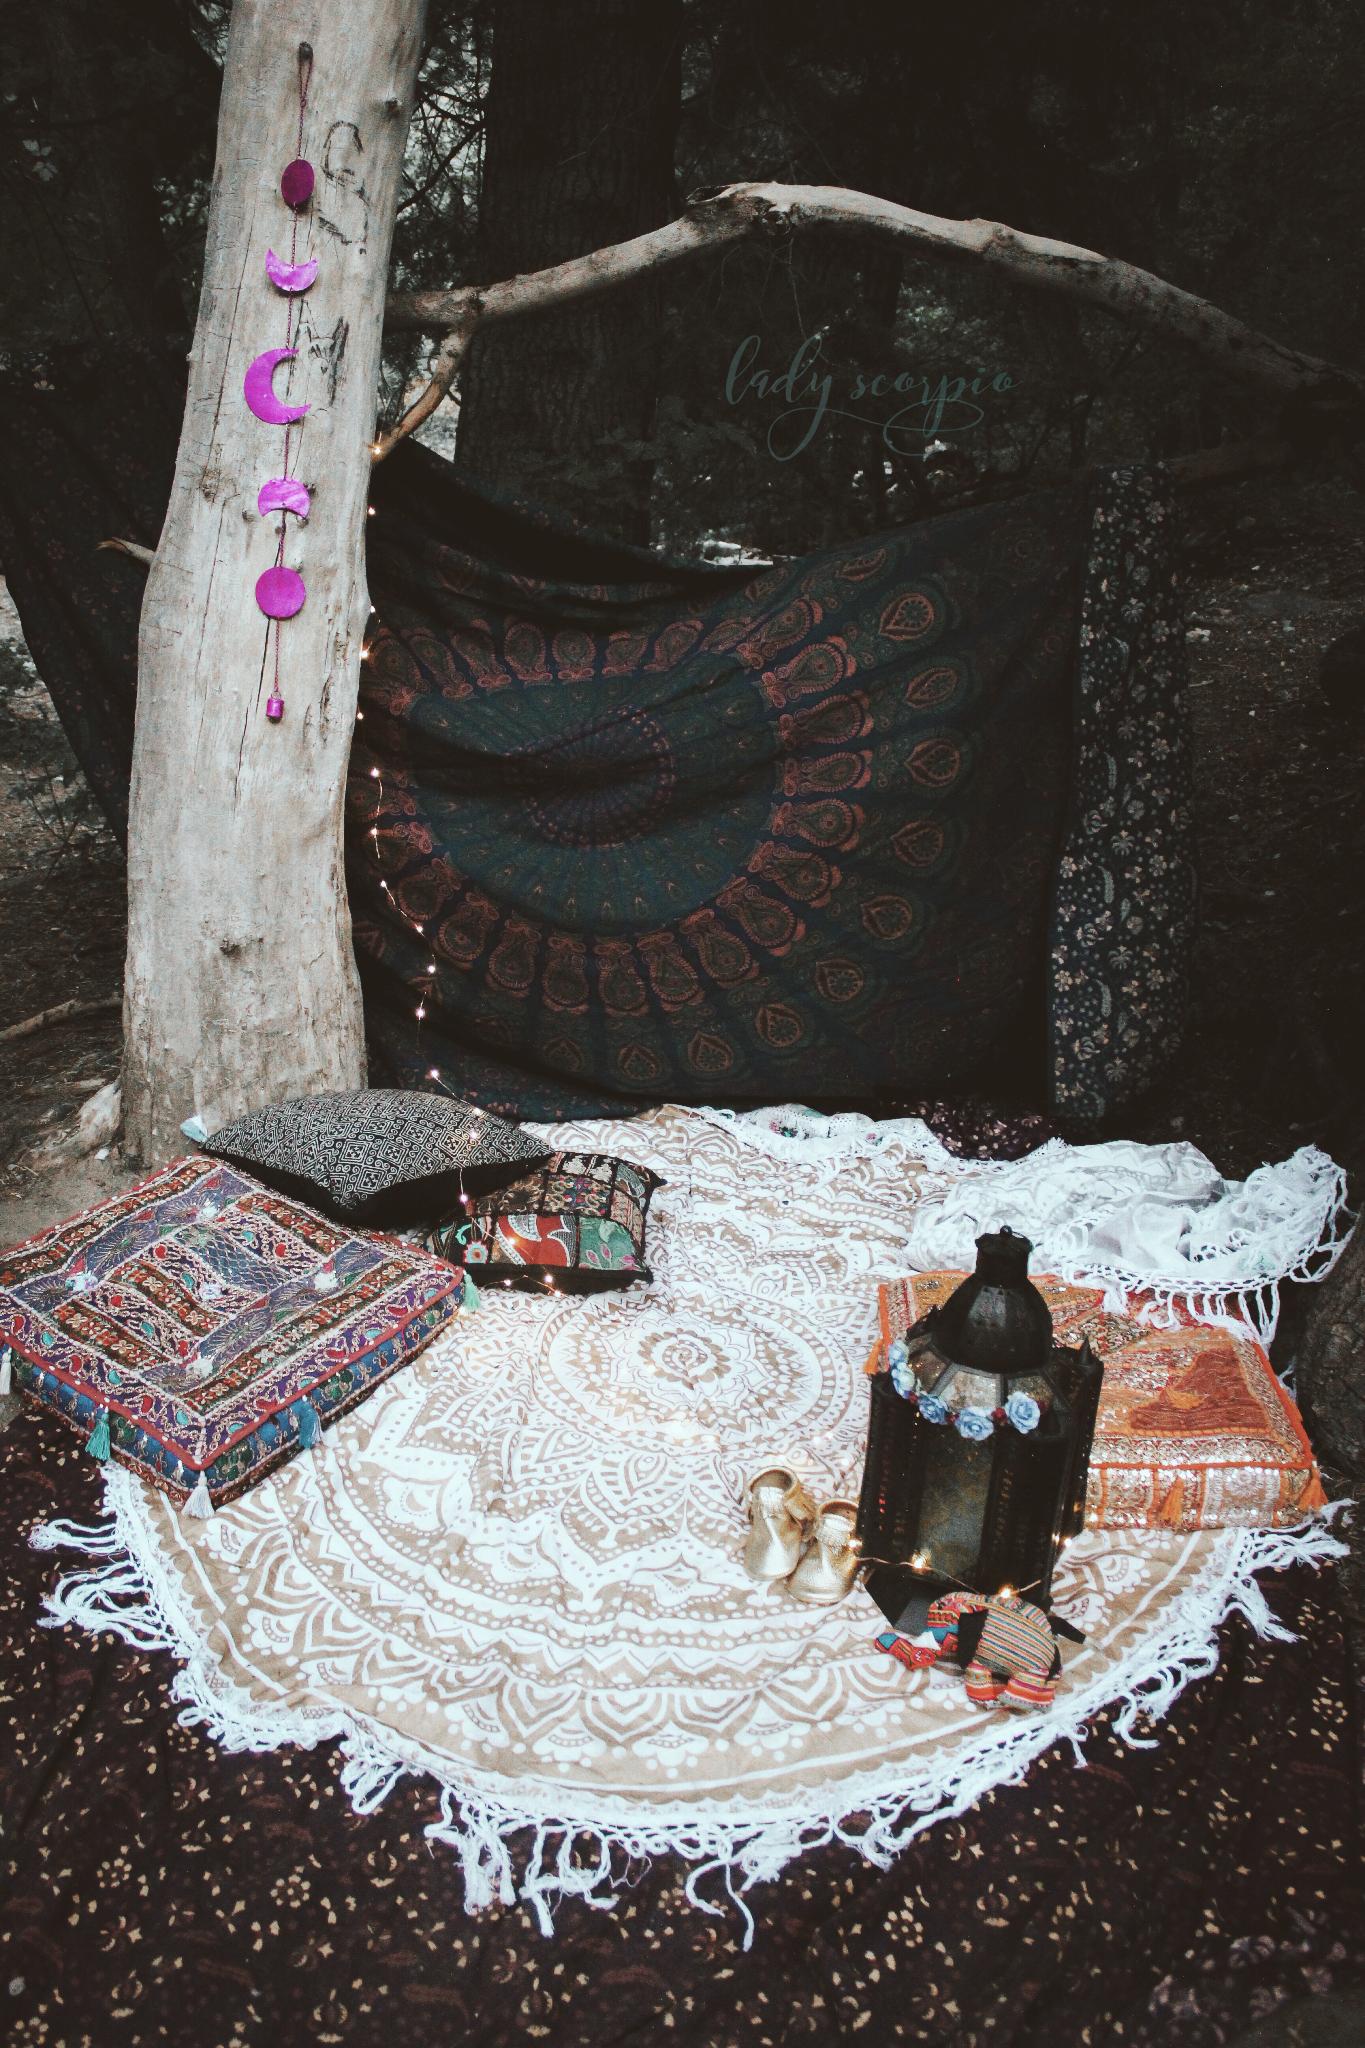 Boho bungalow lady scorpio tapestries u moon phase decor u blog